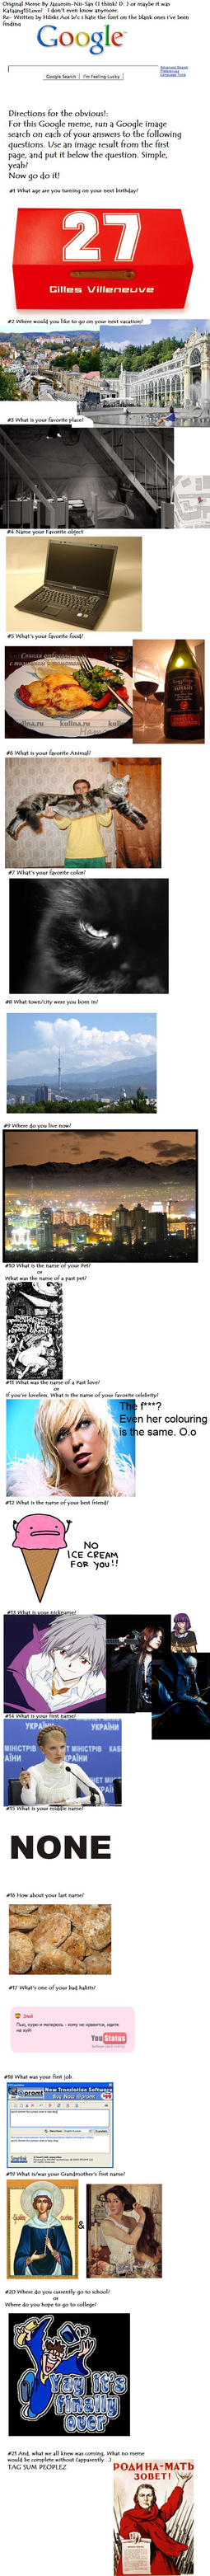 Google meme by Nagisa-Kaworu